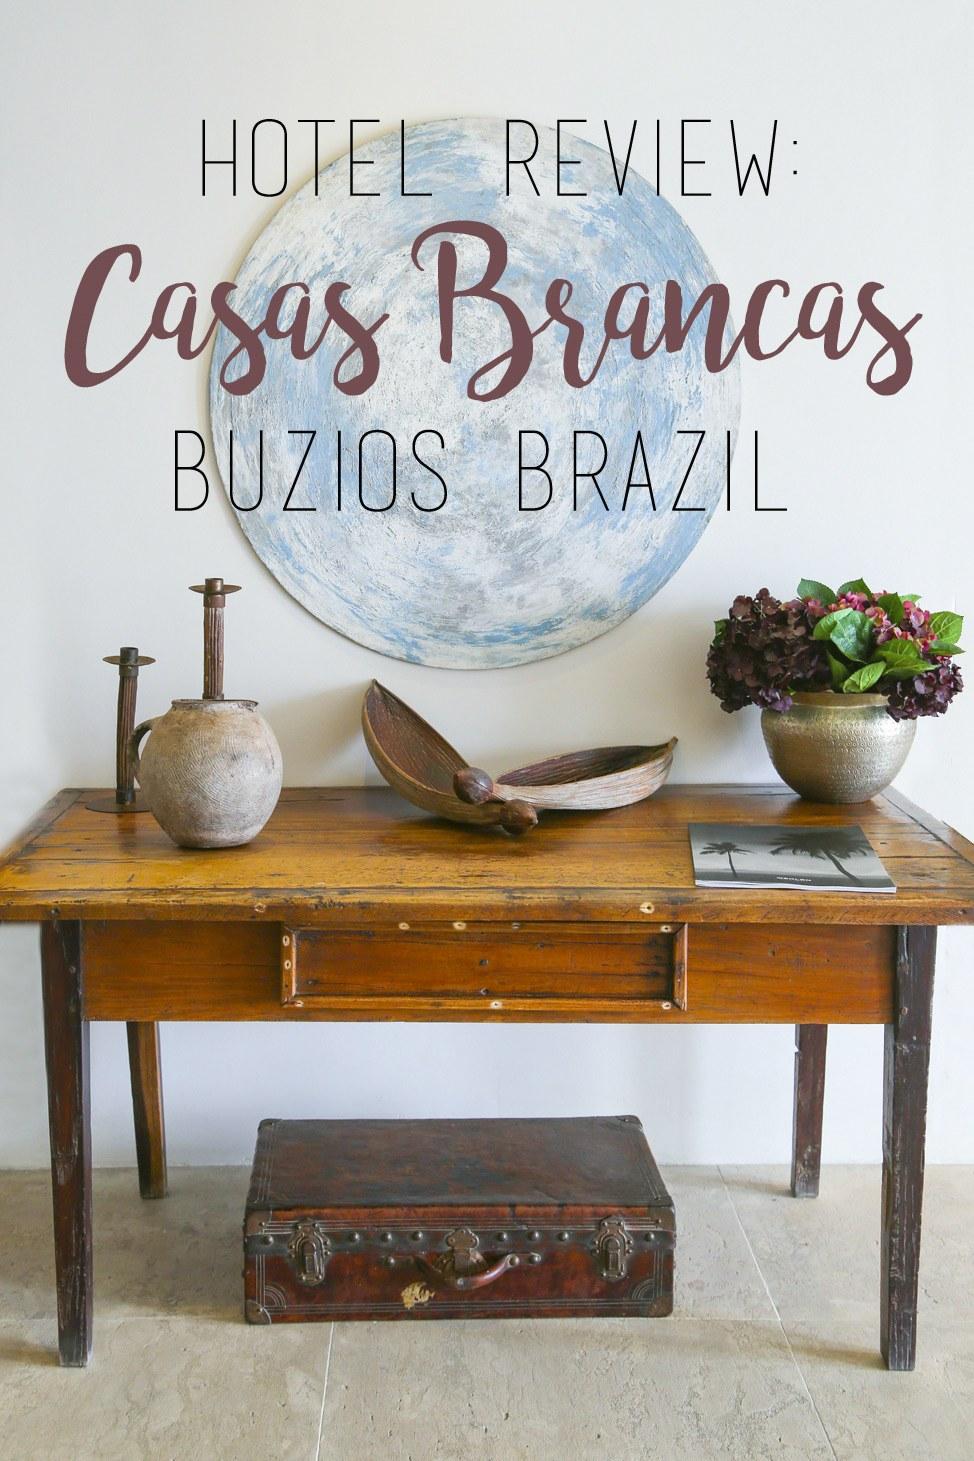 Casas Brancas Hotel Review, Buzios, Brazil